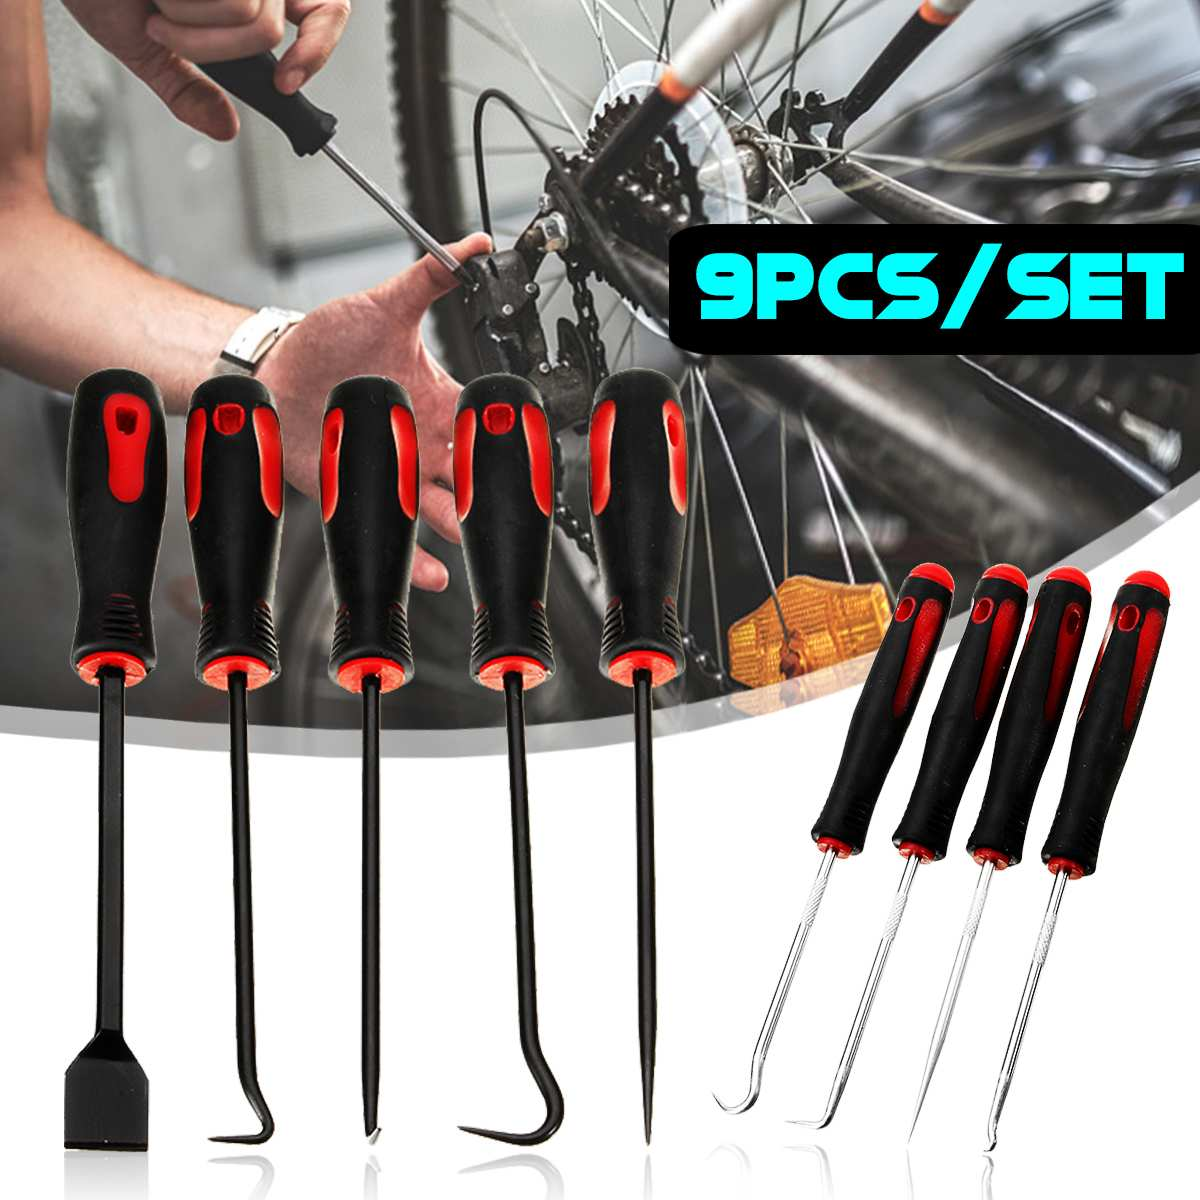 Autoleader 9Pcs Scraper Pick Hook  Tool Set O Ring Gasket Puller Seal Remover Car Auto Repair Tool Chrome Vanadium Steel